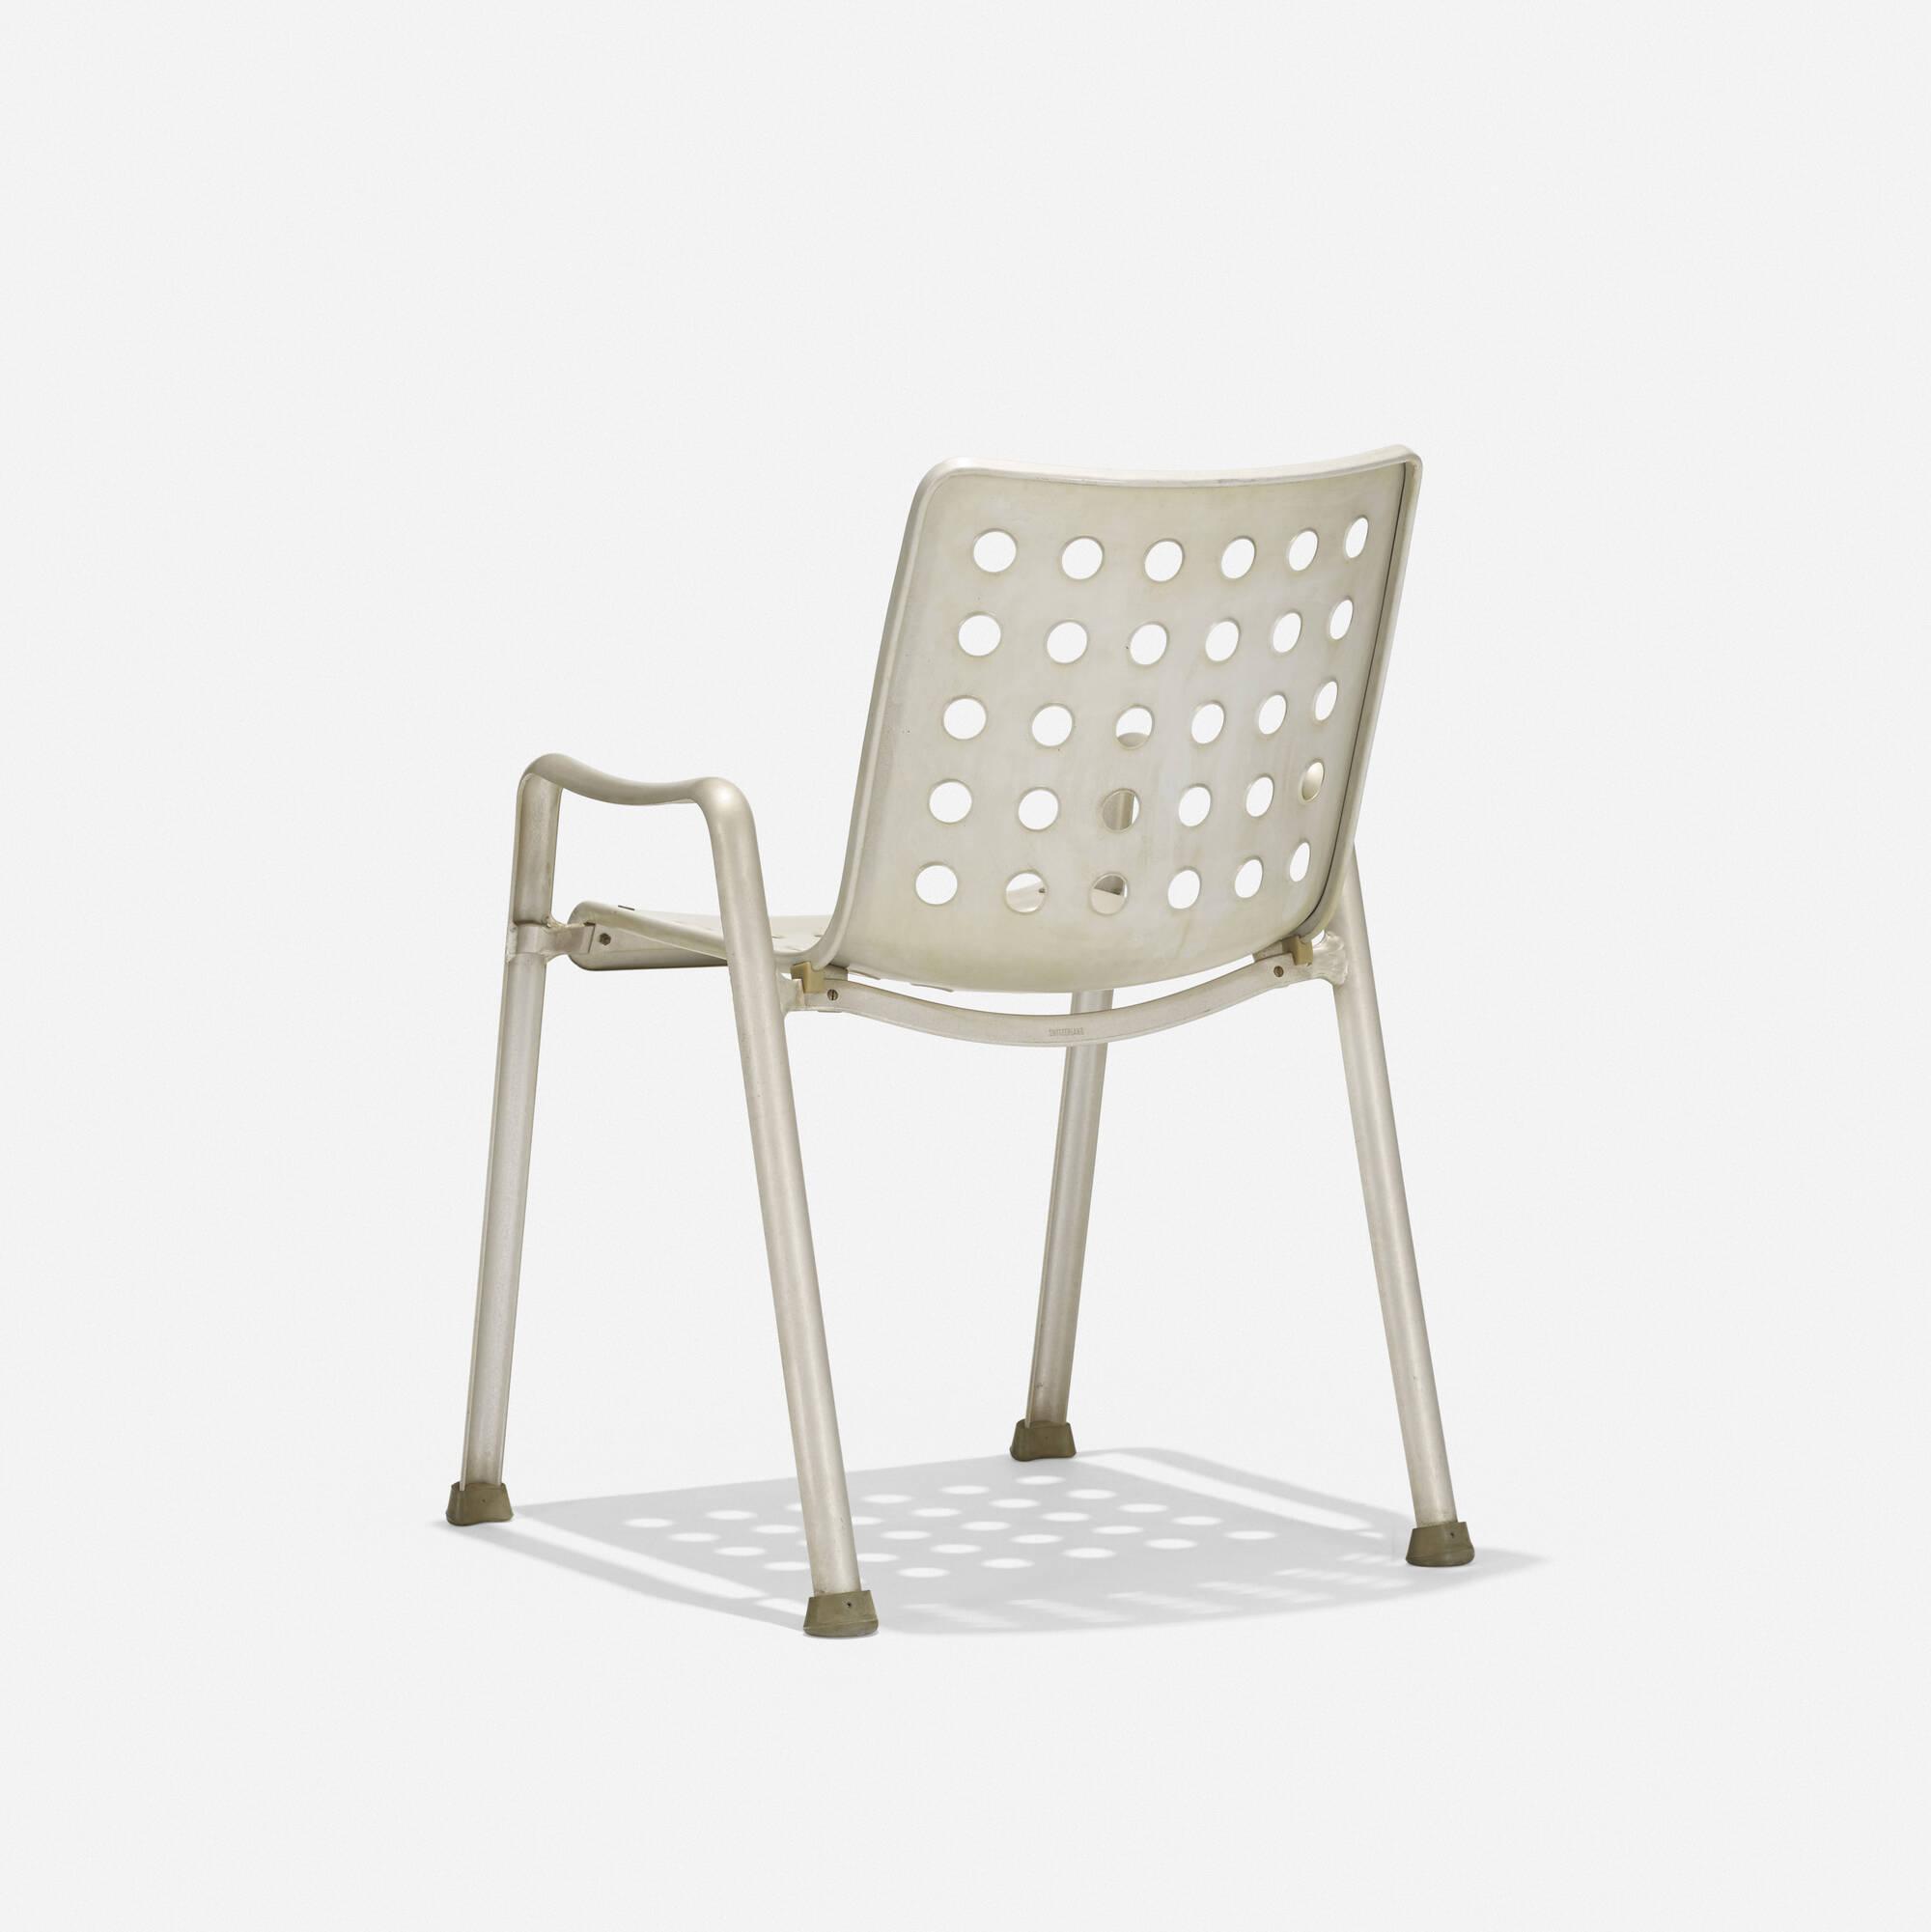 136: Hans Coray / Landi chair (2 of 3)